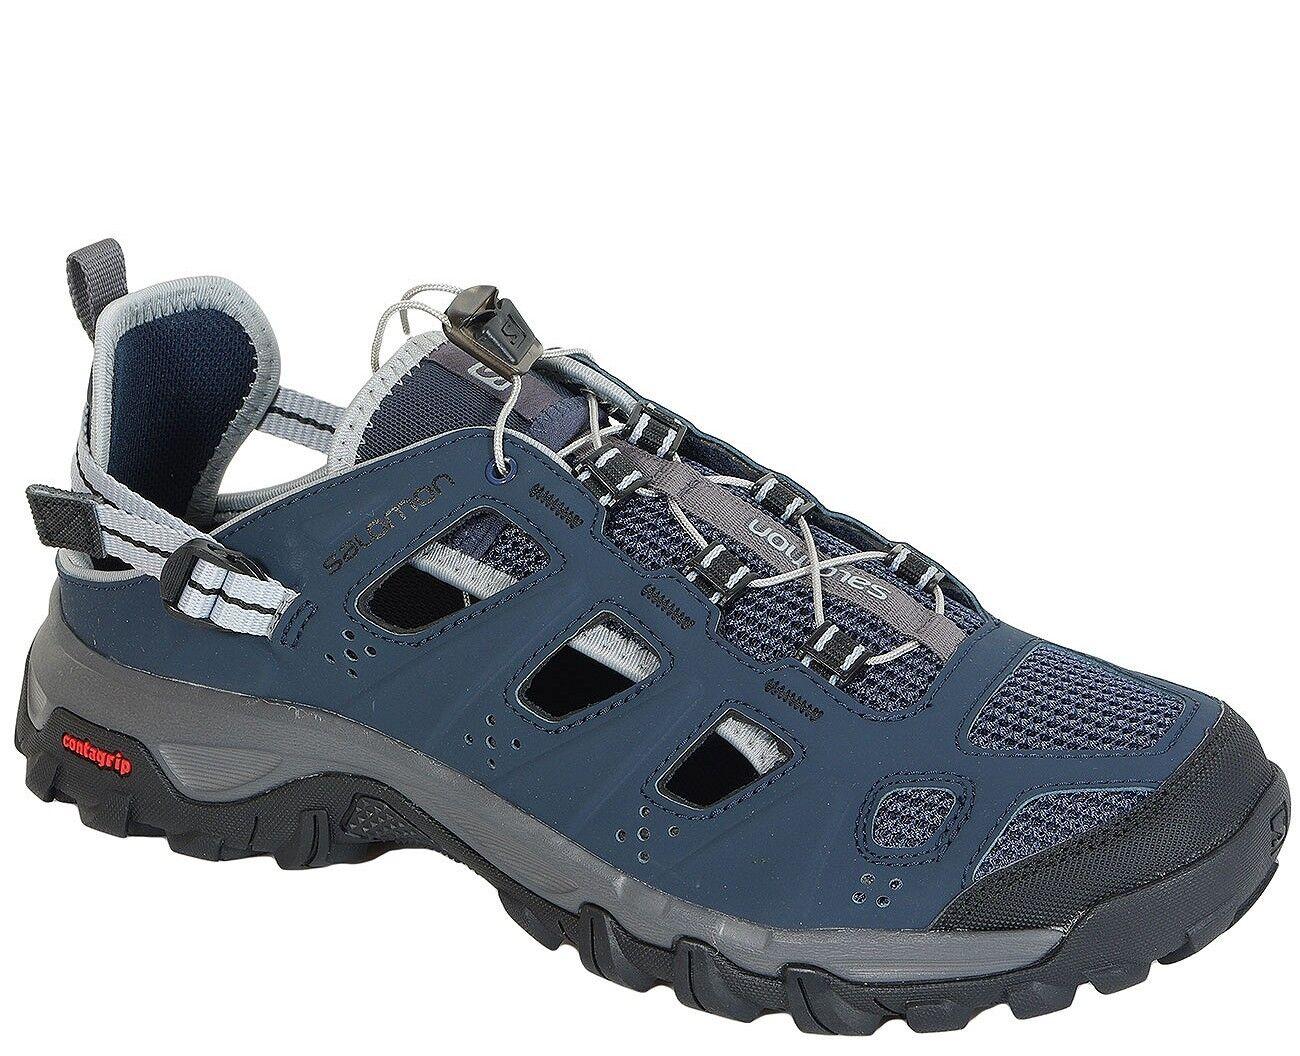 Salomon SALE sandals Evasion Cabrio Deep Blue/Dark Cloud